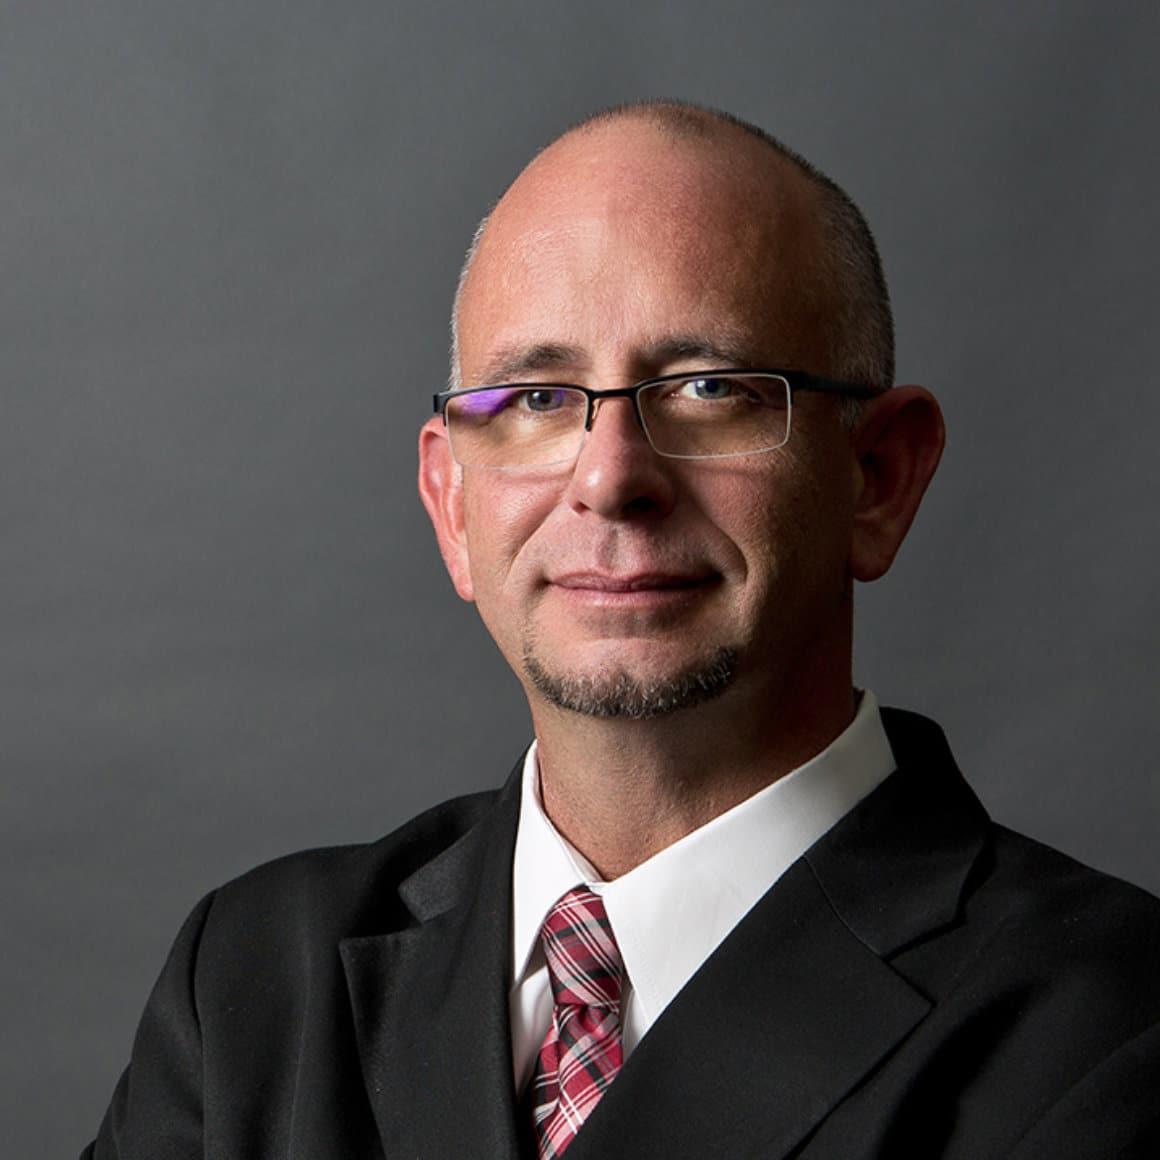 G. Ross Dietrich